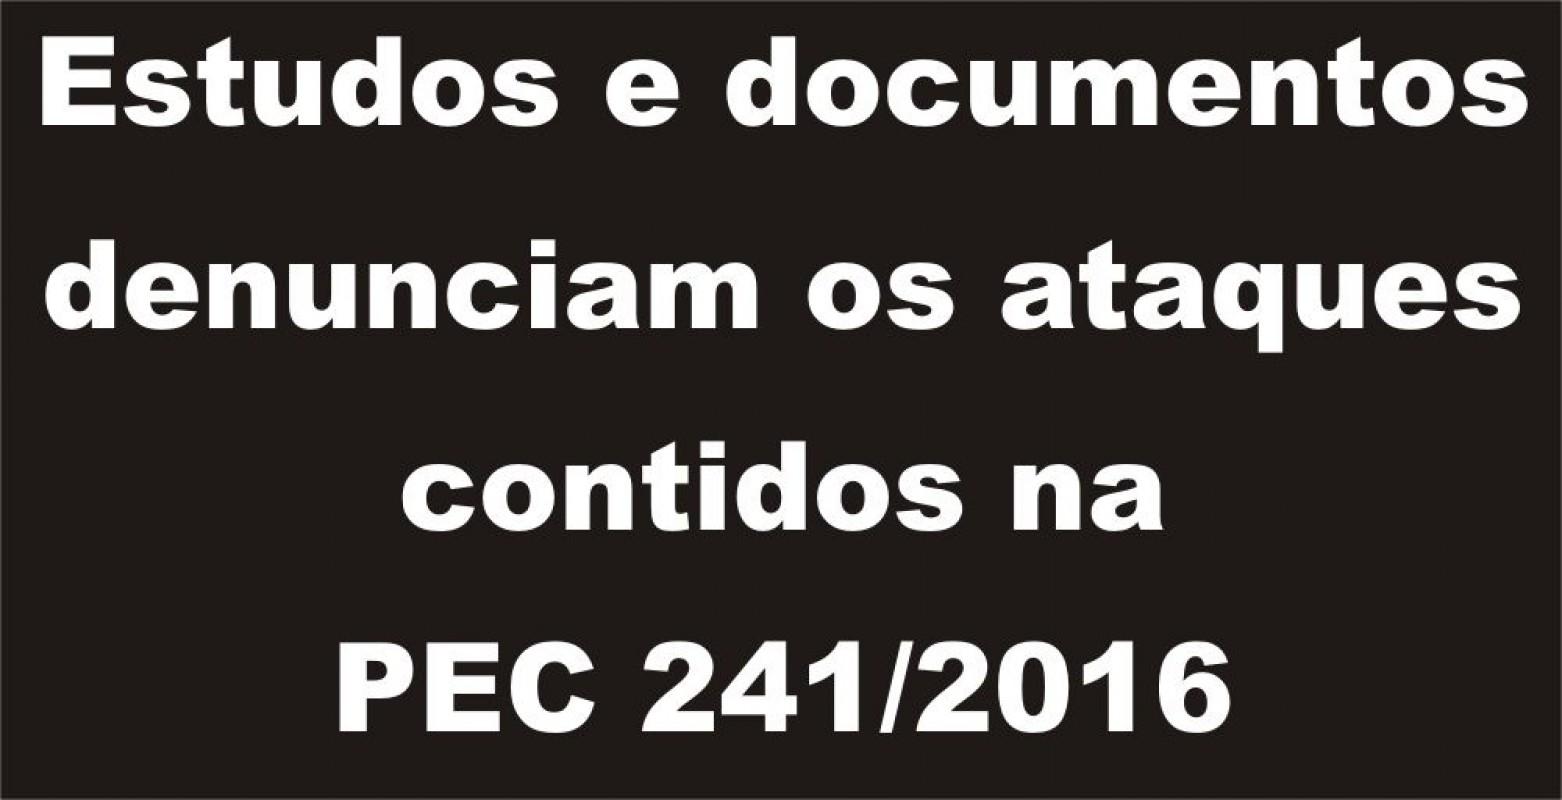 Estudos e documentos denunciam os ataques contidos na PEC 241-2016